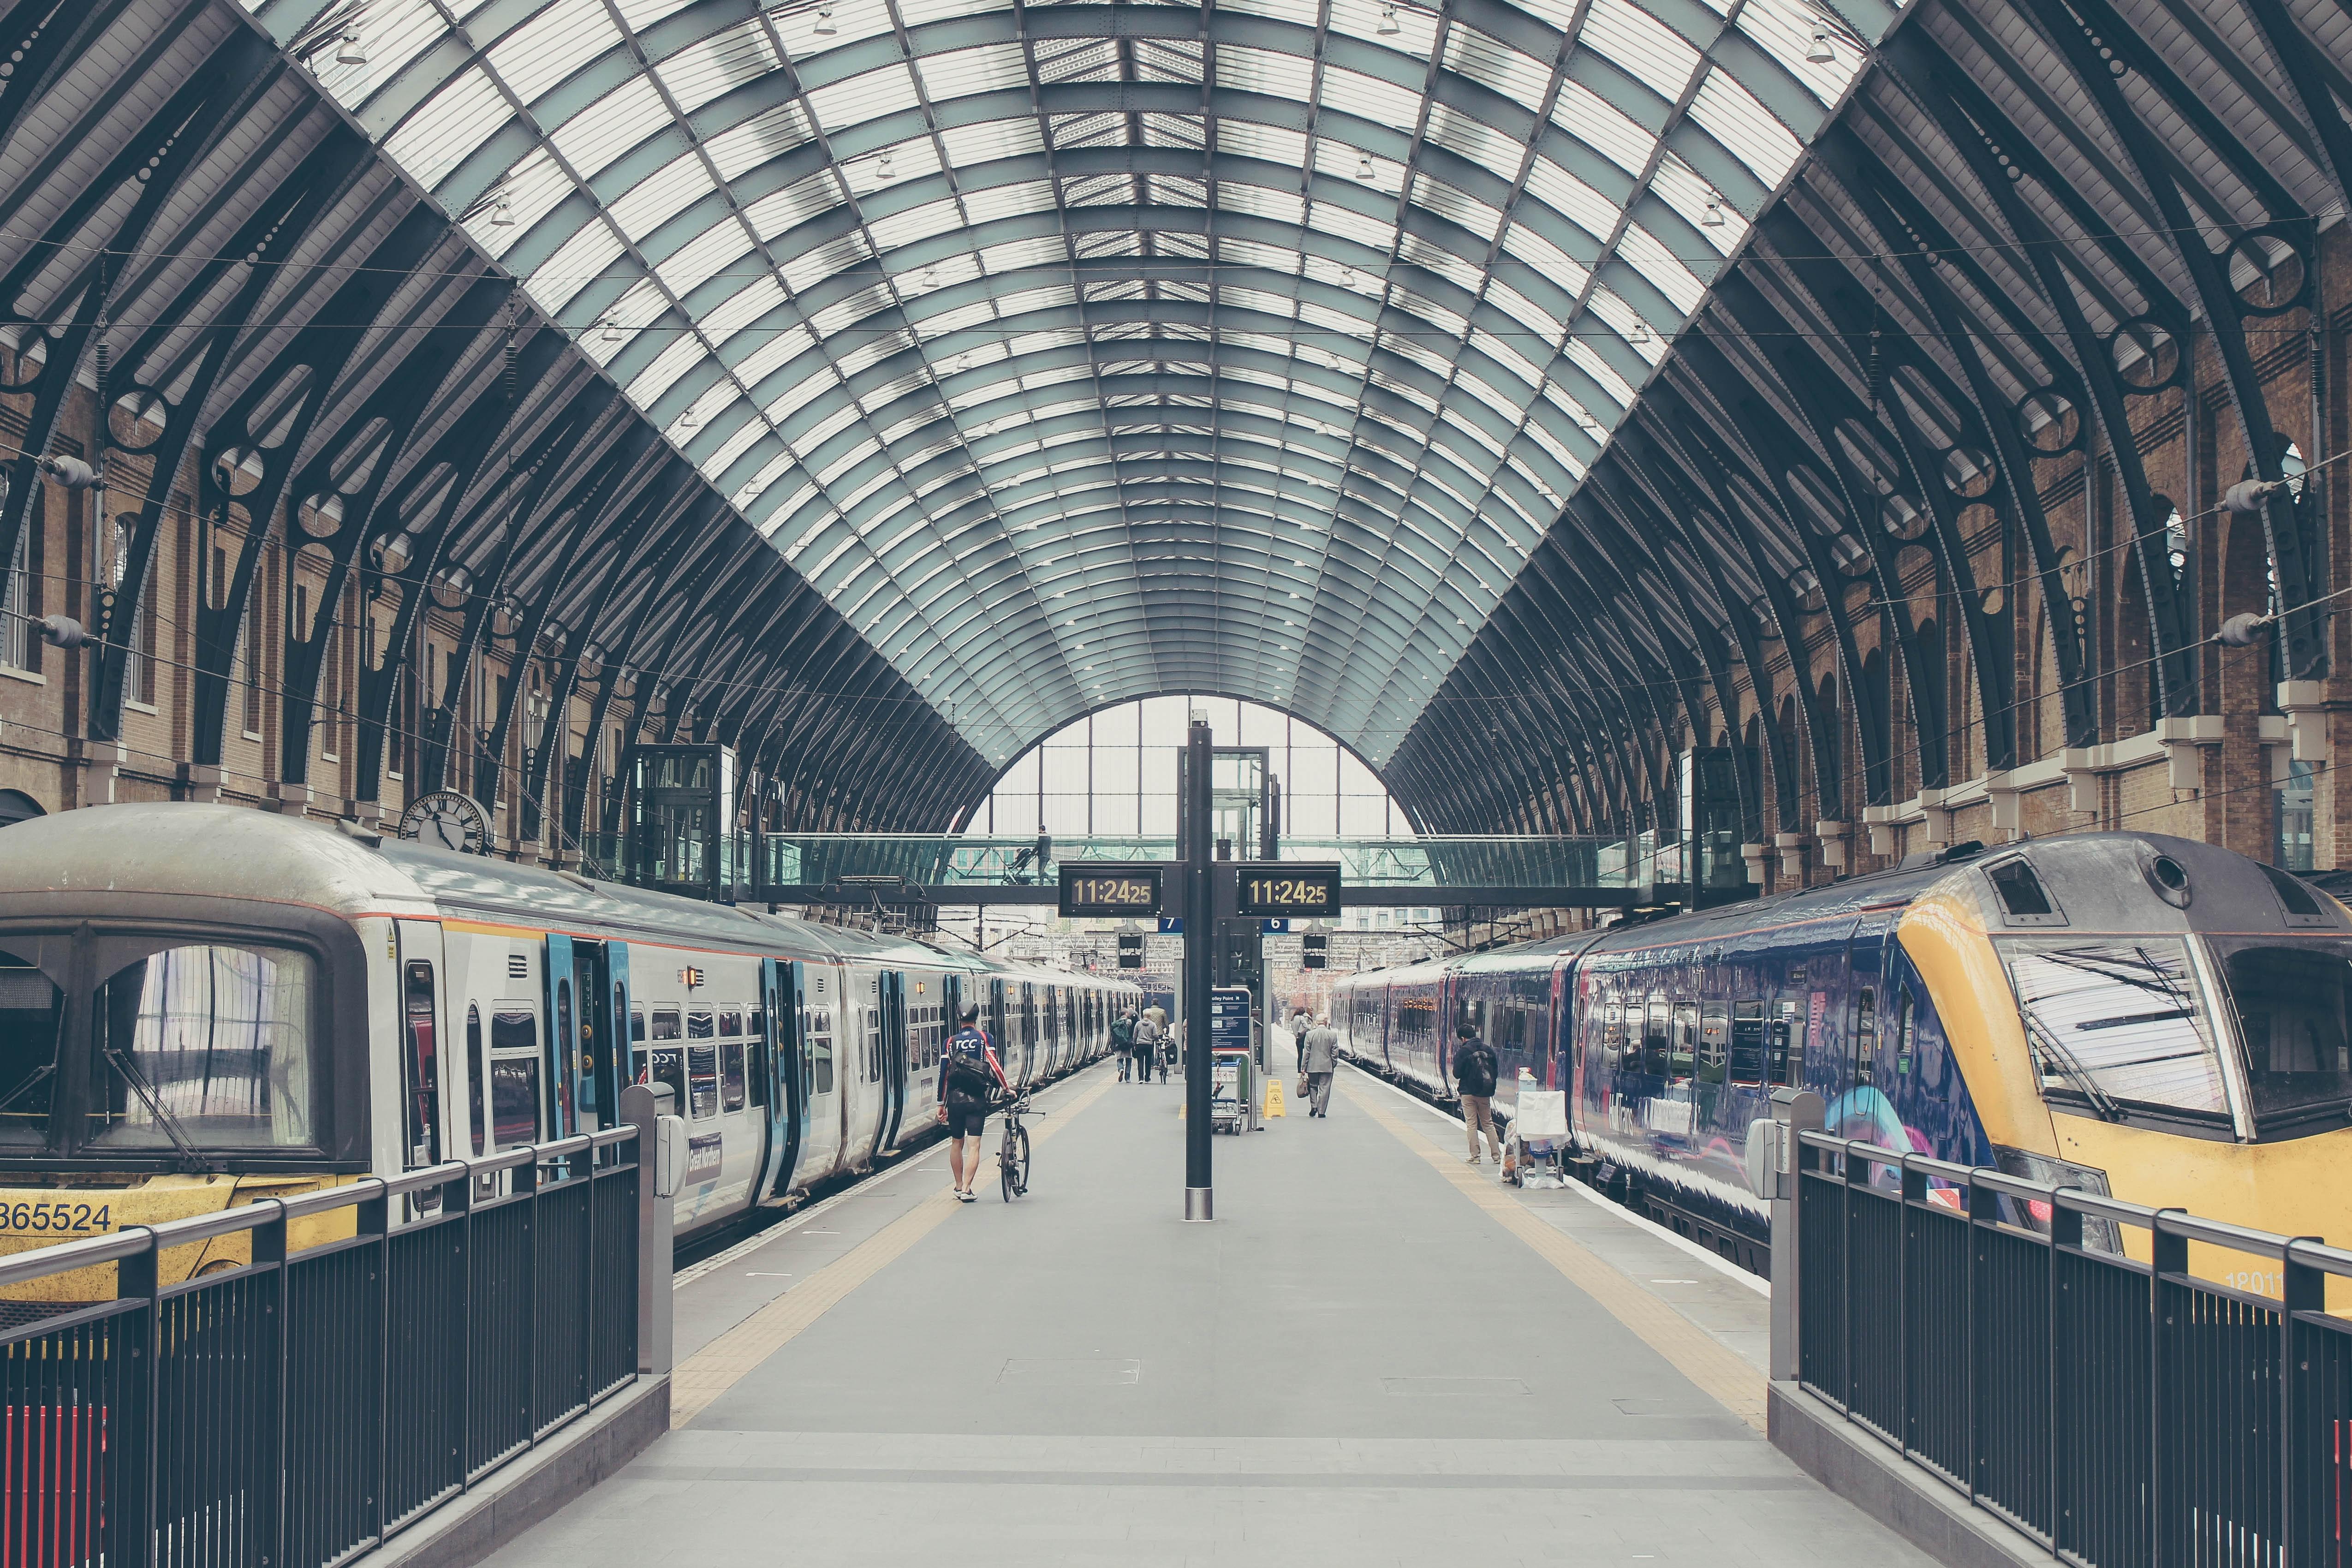 Train station platform at King's Cross, London, United Kingdom